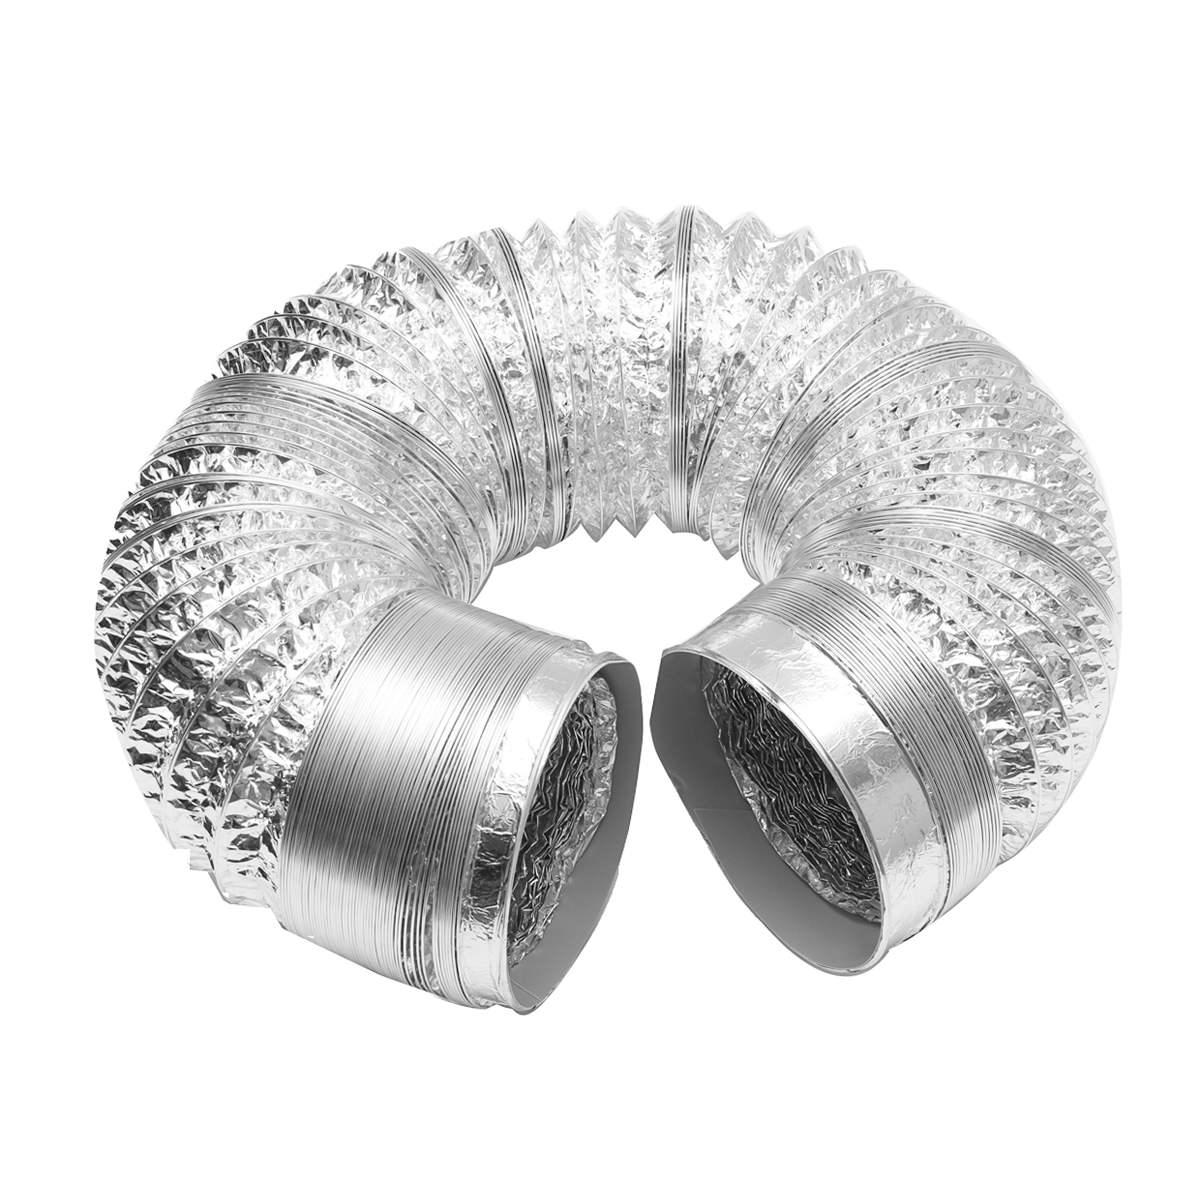 "Aluminium Foil Ducting Flexible Hydroponic Ventilation 4 5 6 8 10/"" 5M or 10M"